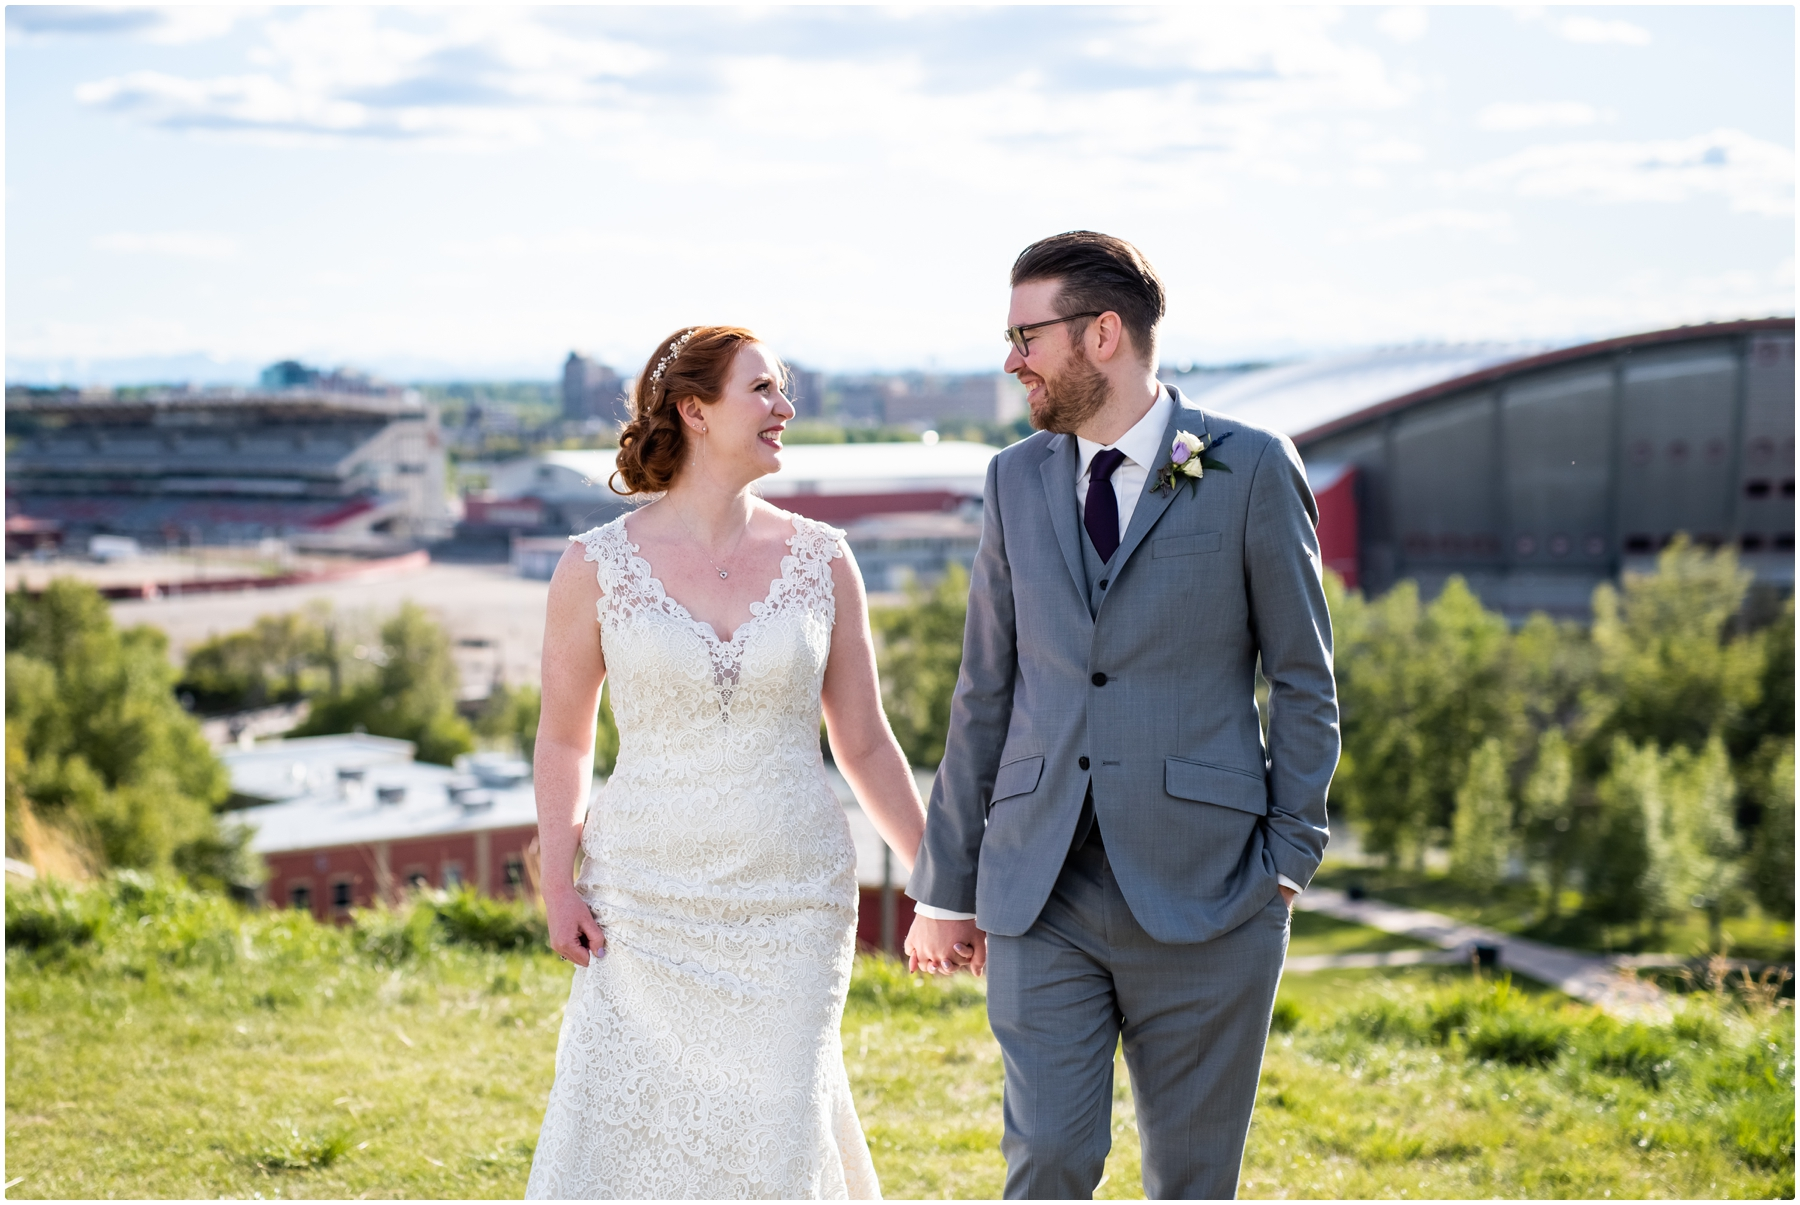 Calgary Downtown Skyline Wedding Photography